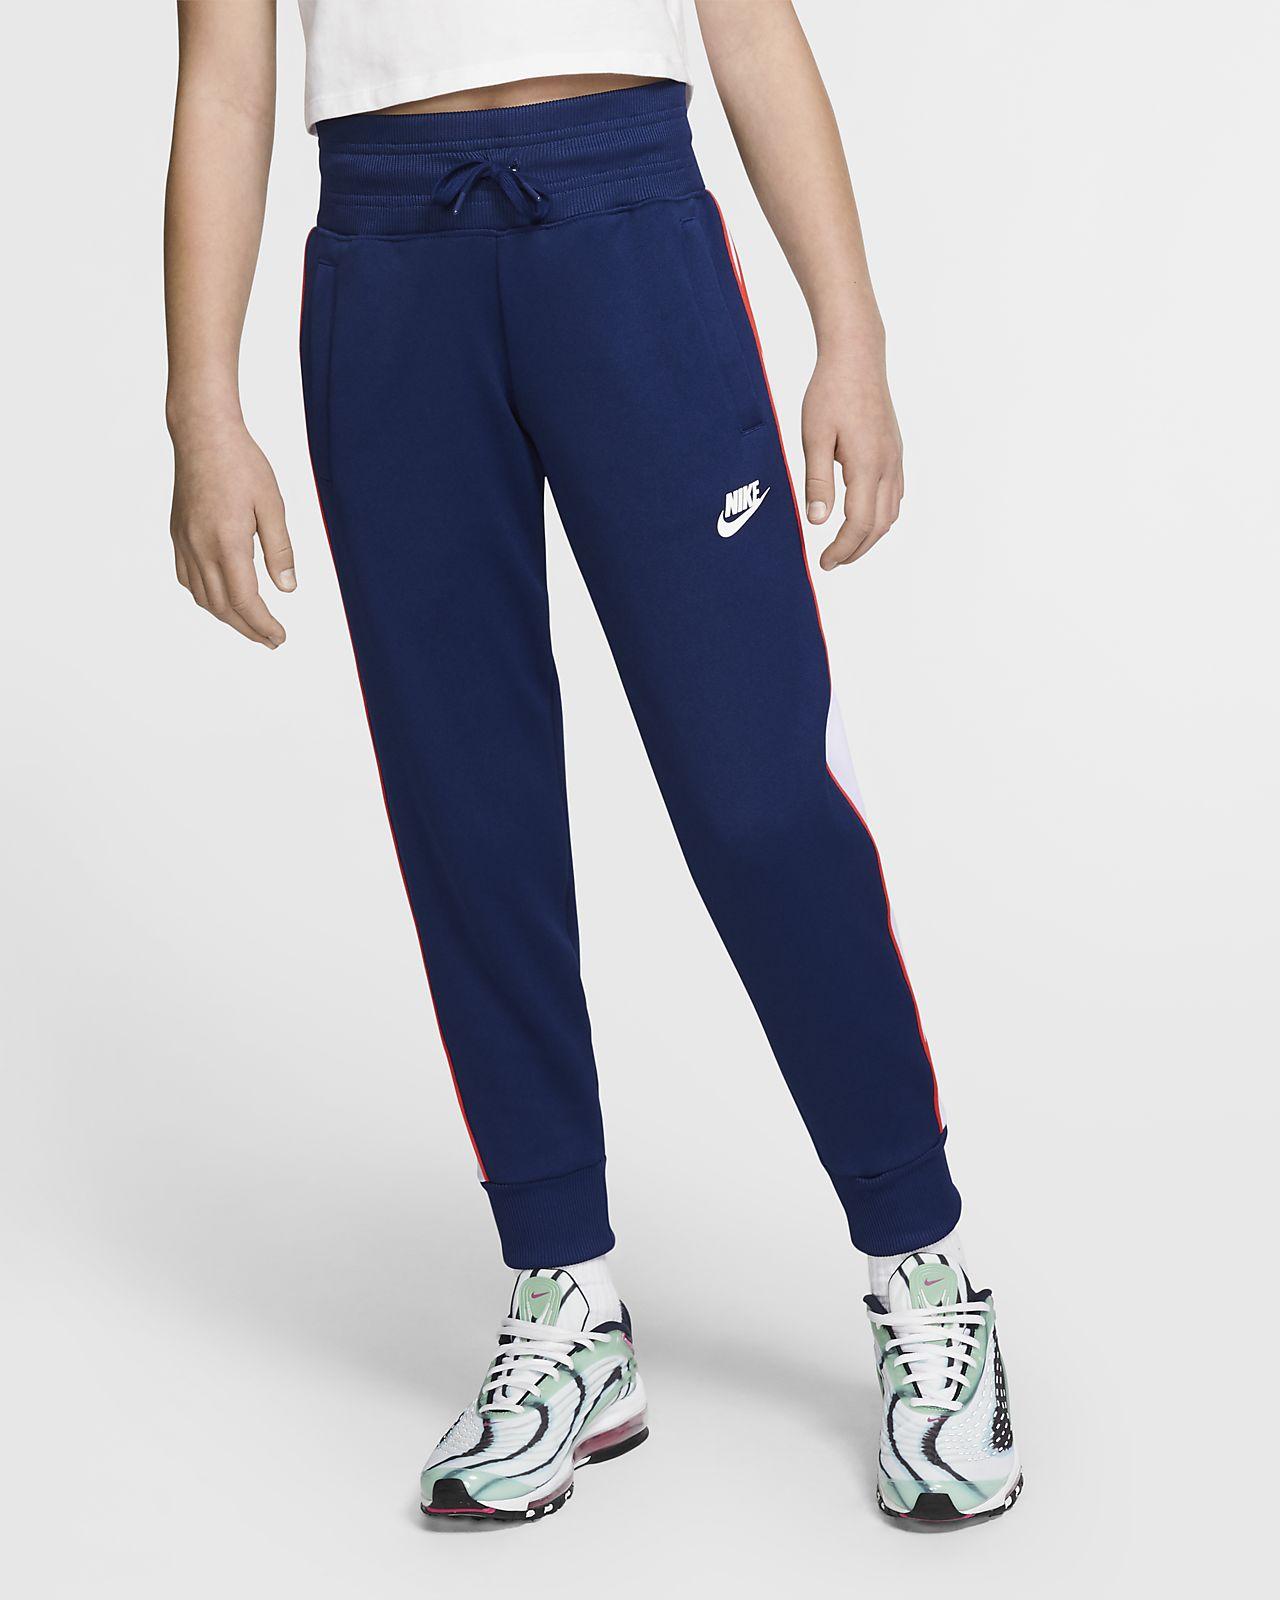 Pantalon Nike Sportswear Heritage pour Fille plus âgée